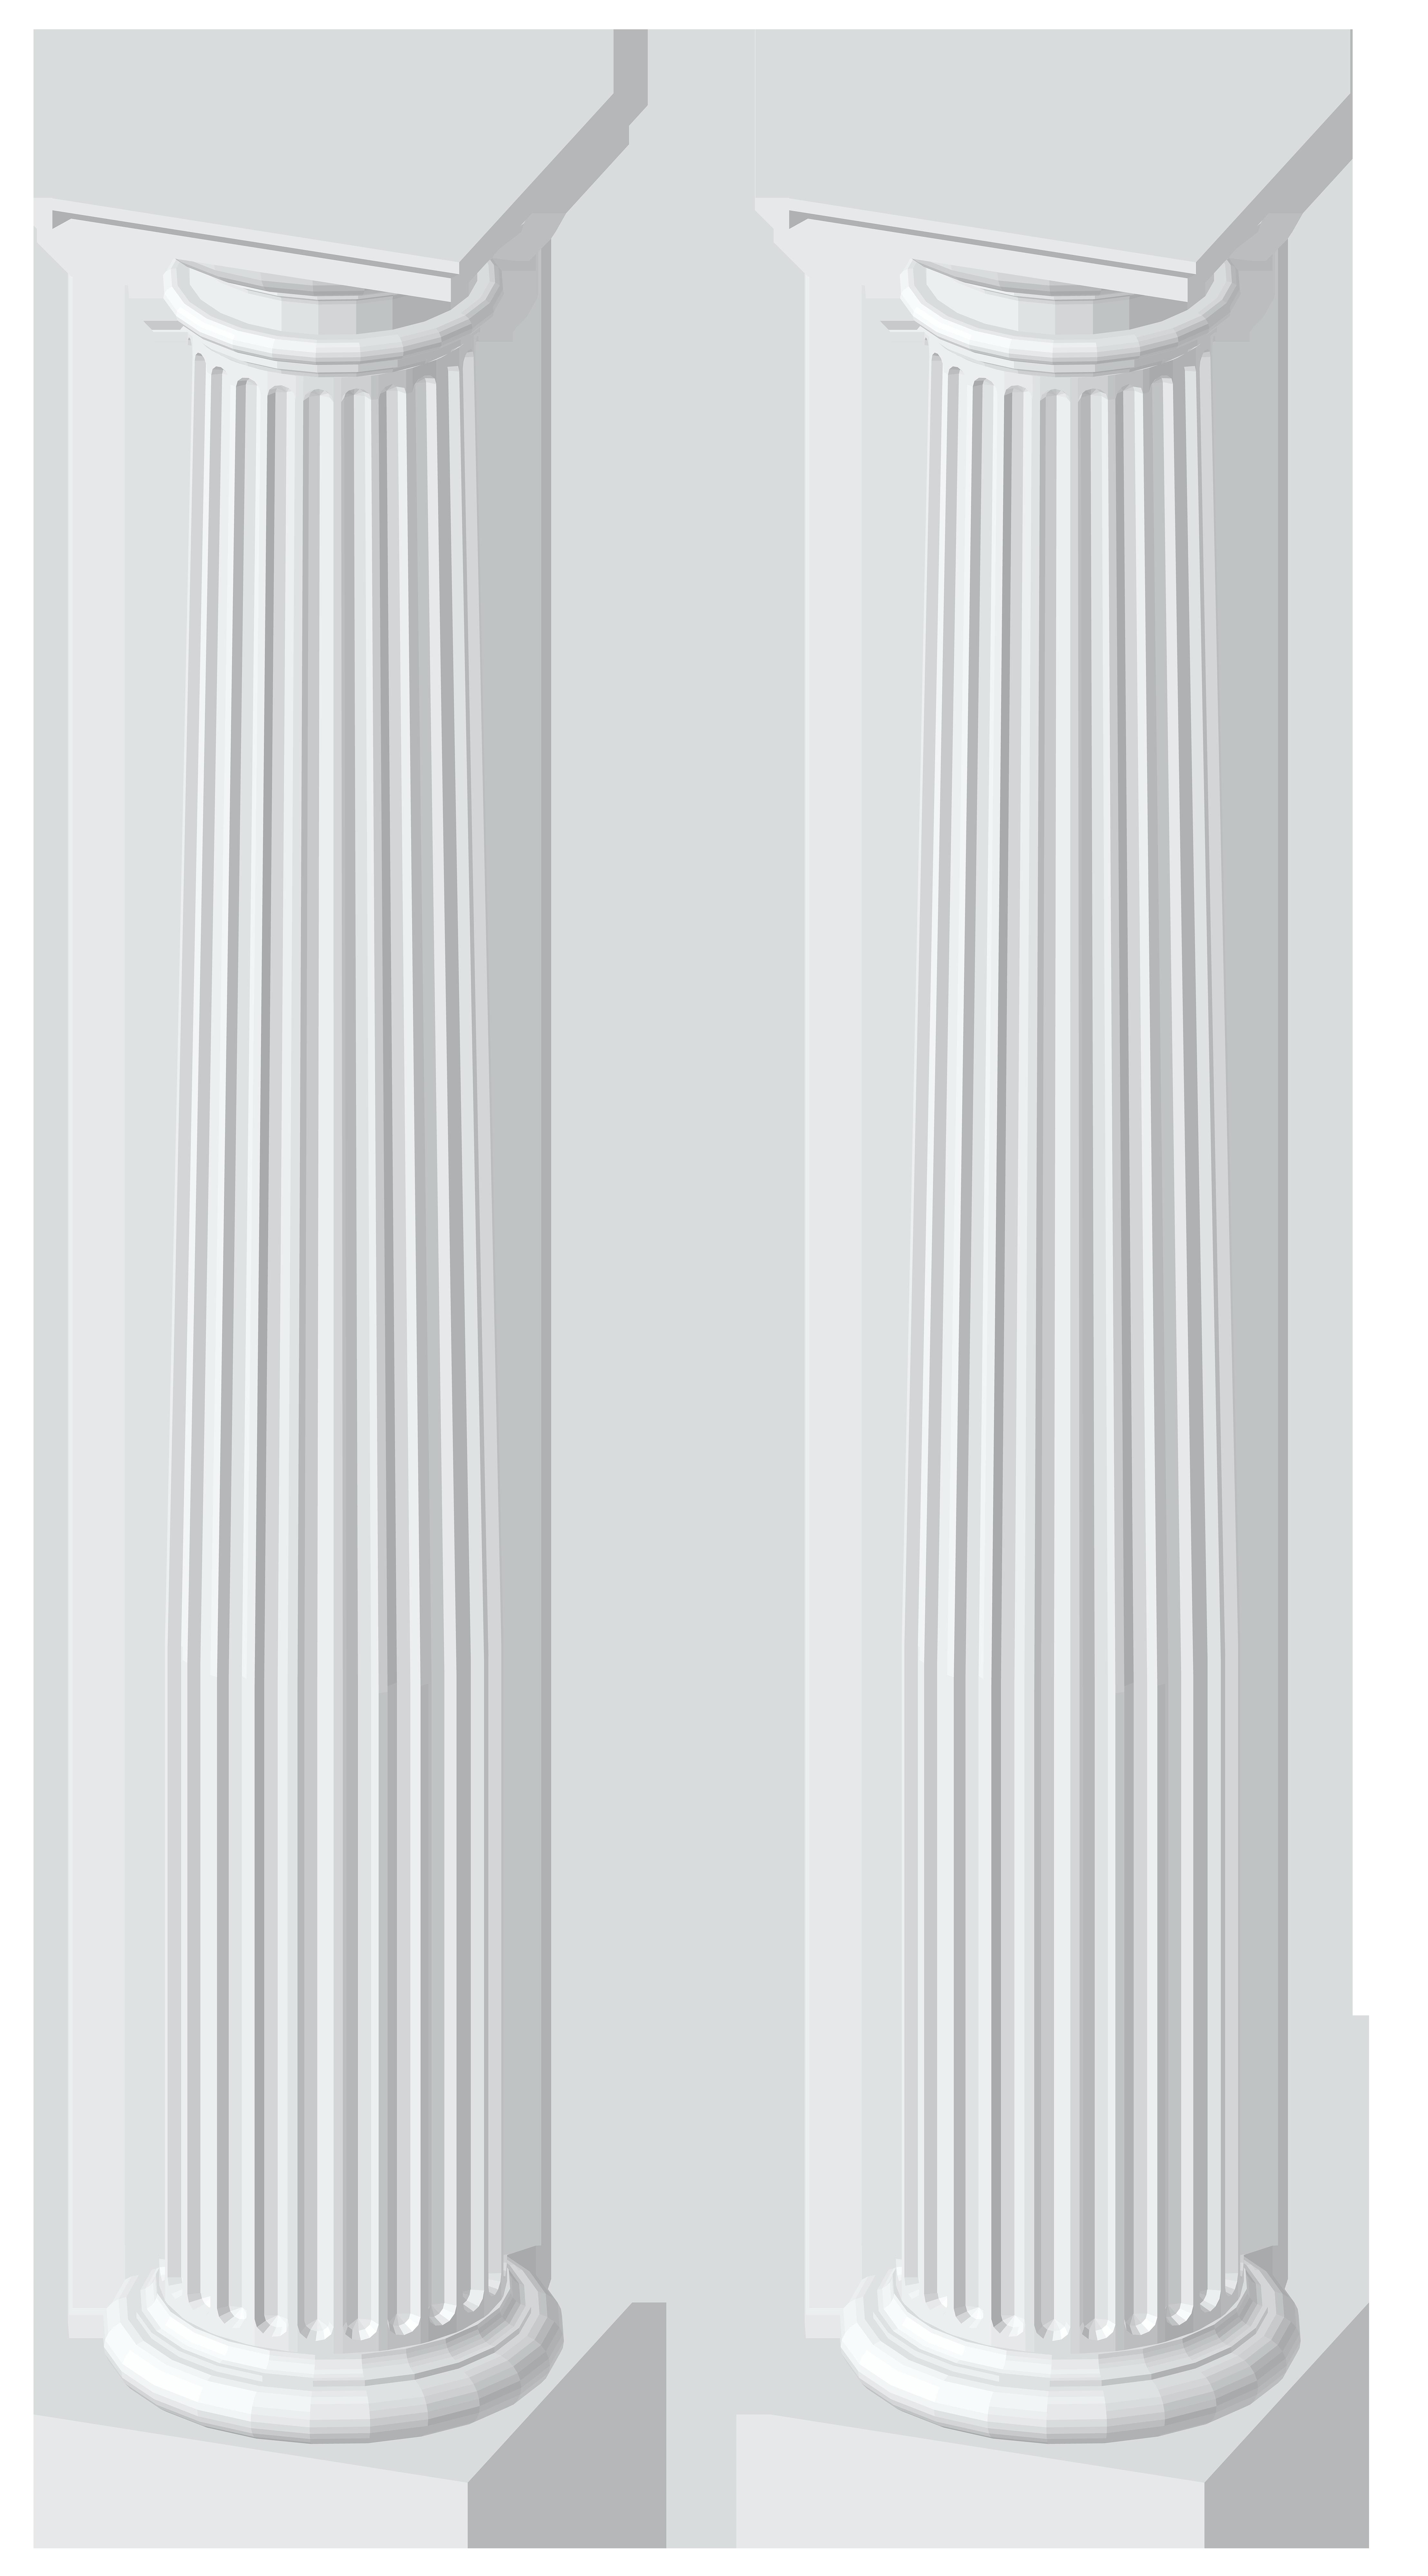 White columns transparent png. Column clipart pillers